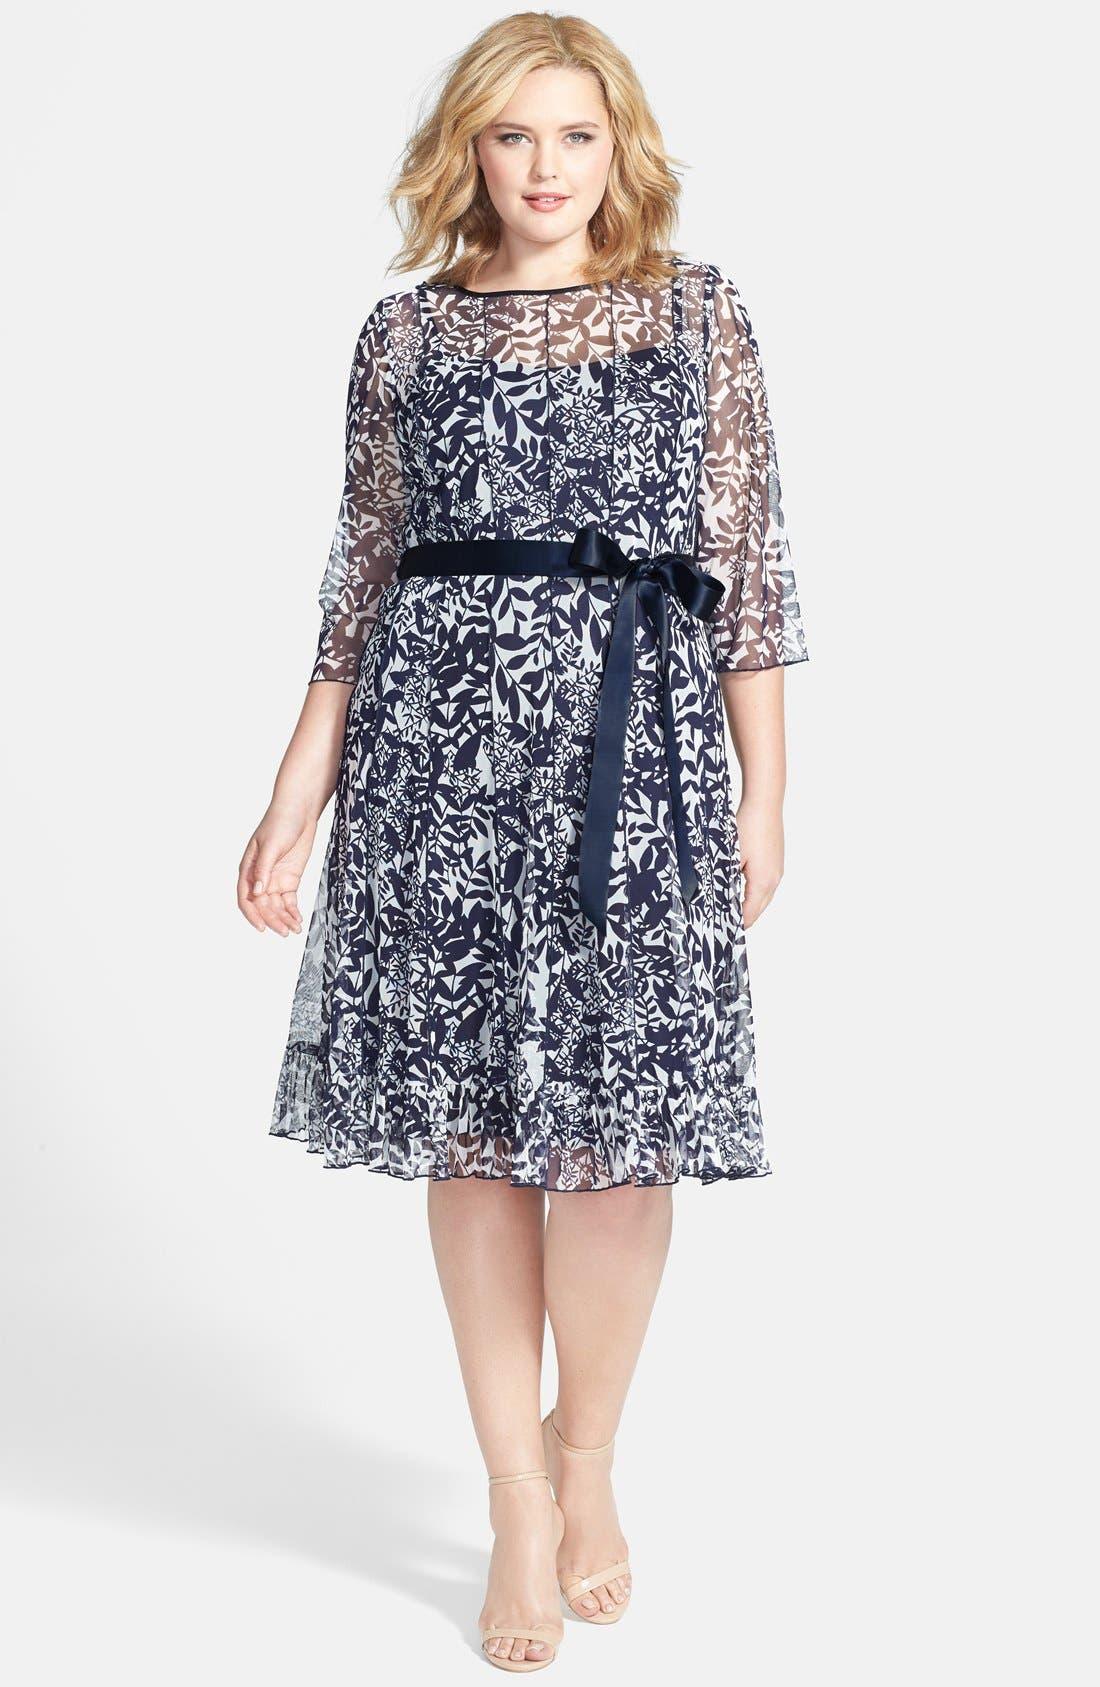 Alternate Image 1 Selected - Jessica Howard Satin Sash Pintuck Print Dress (Plus Size)